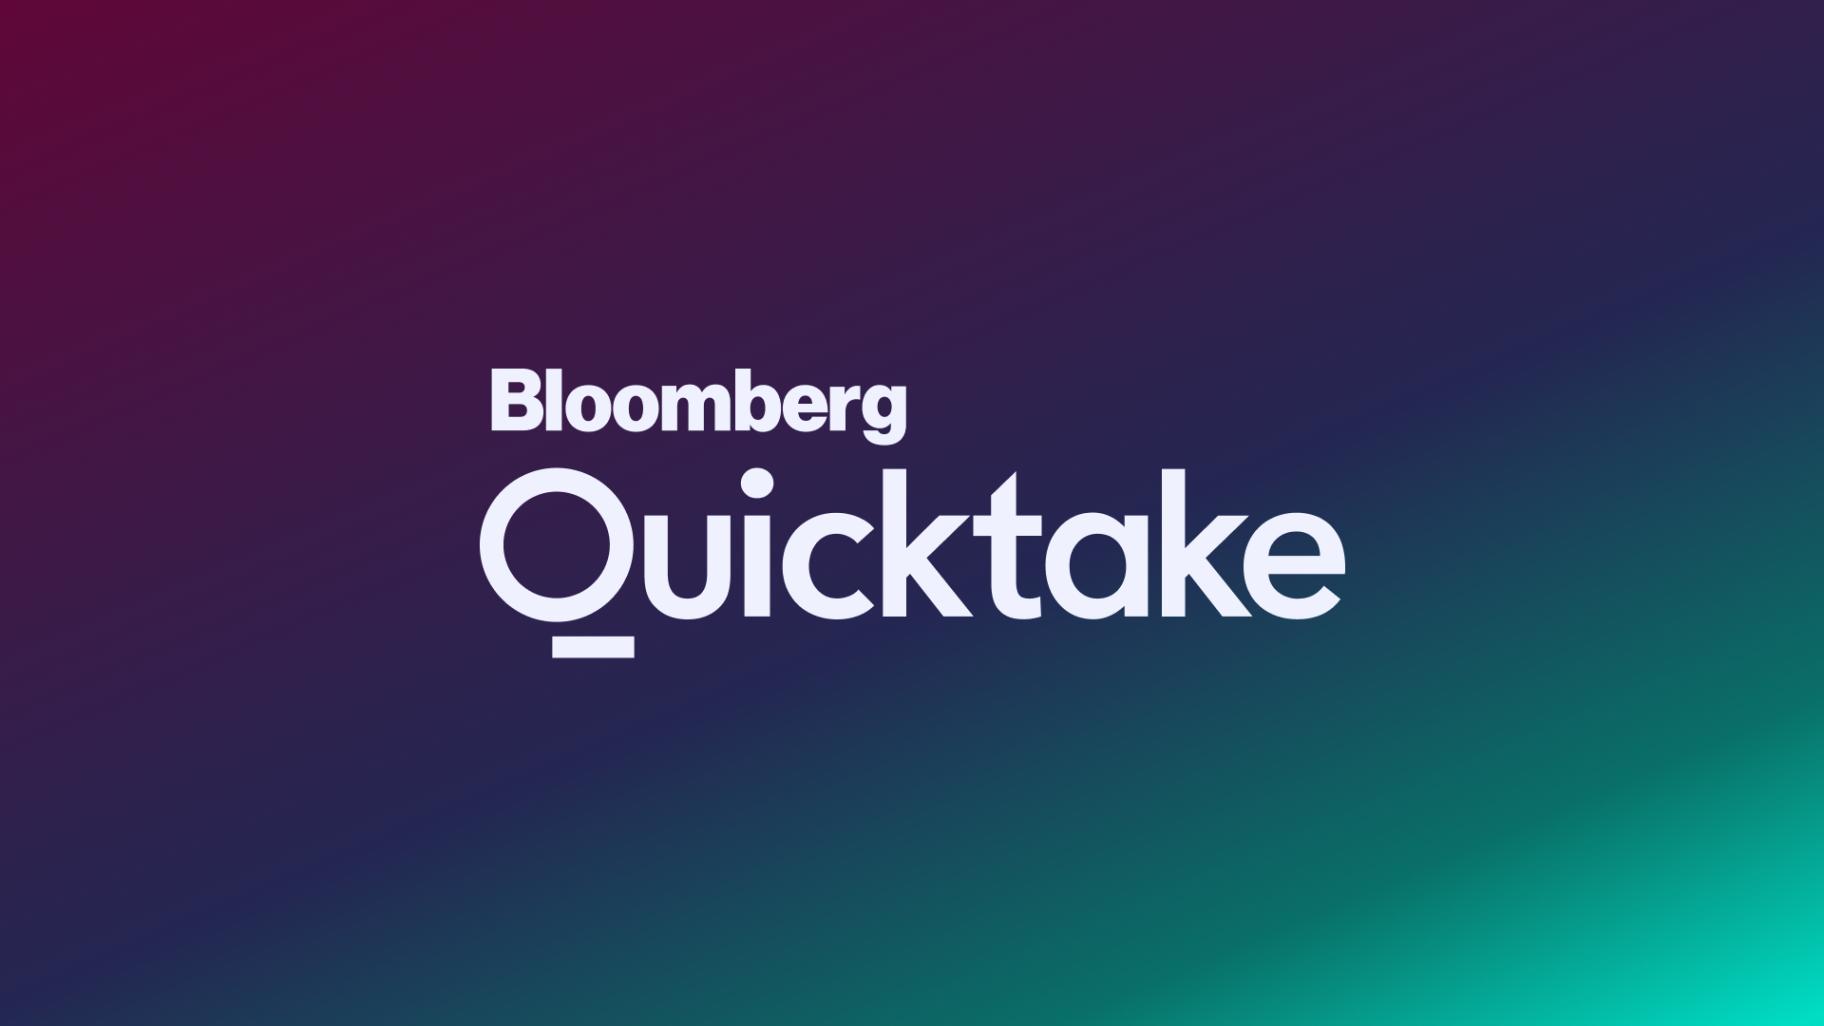 Bloomberg Quicktake